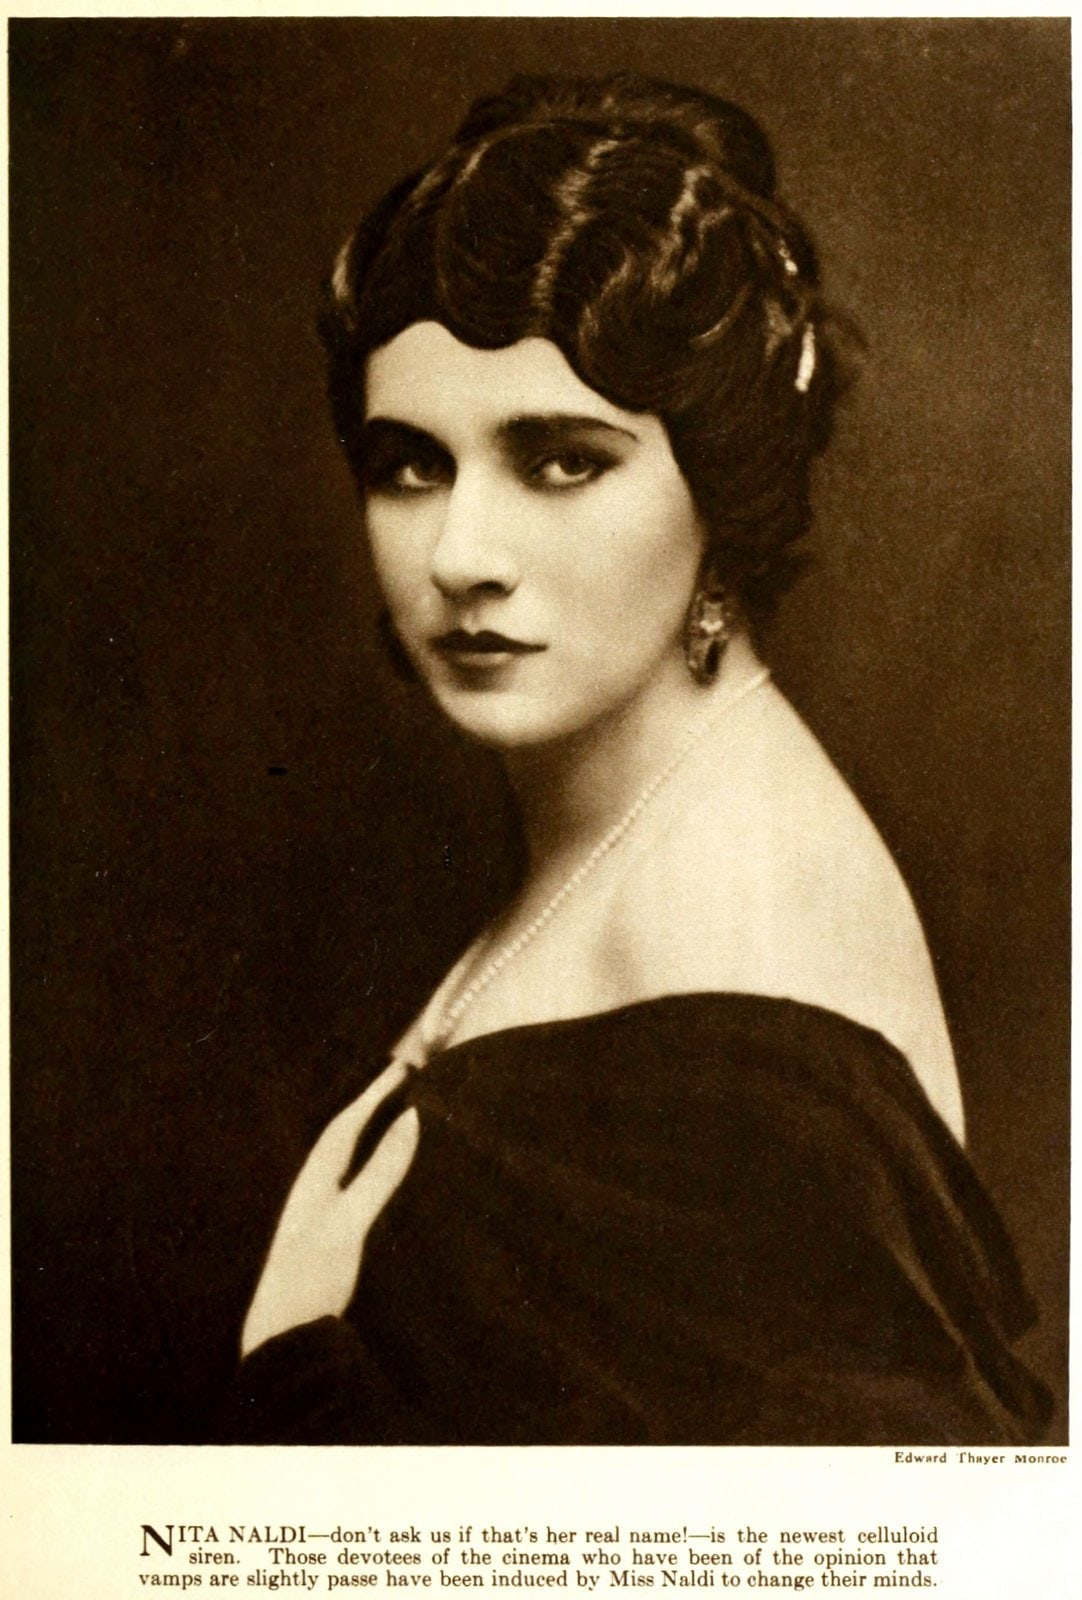 Real vintage 1920s hairstyles for women - actress Nita Naldi